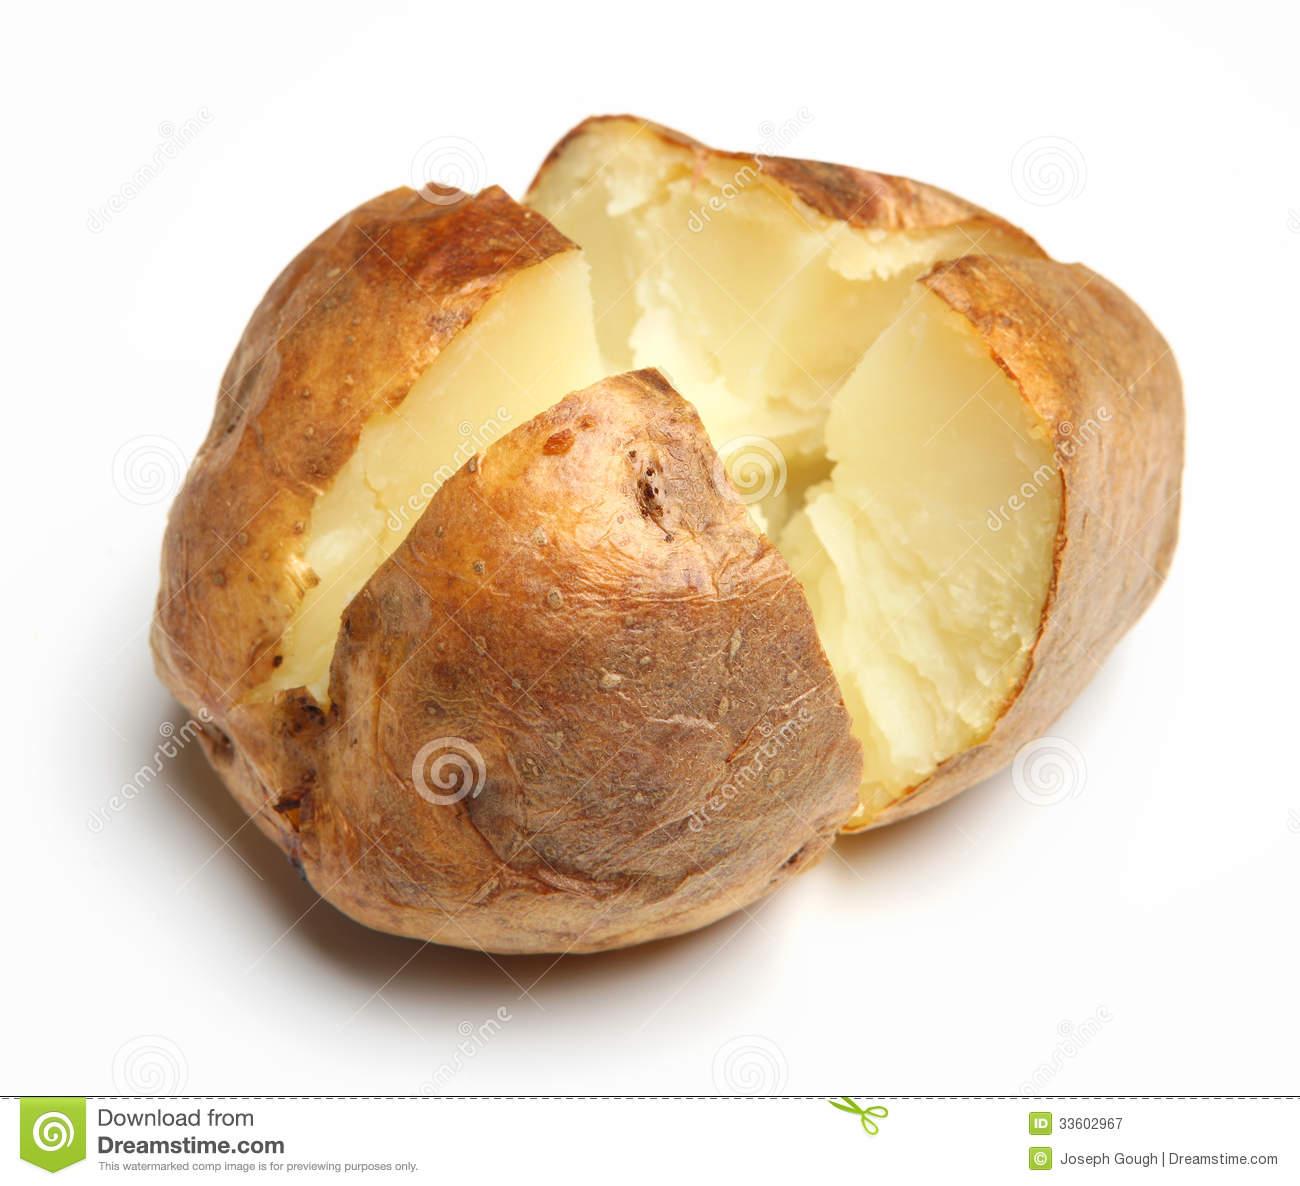 Clipart baked potato plain jacket potato royalty